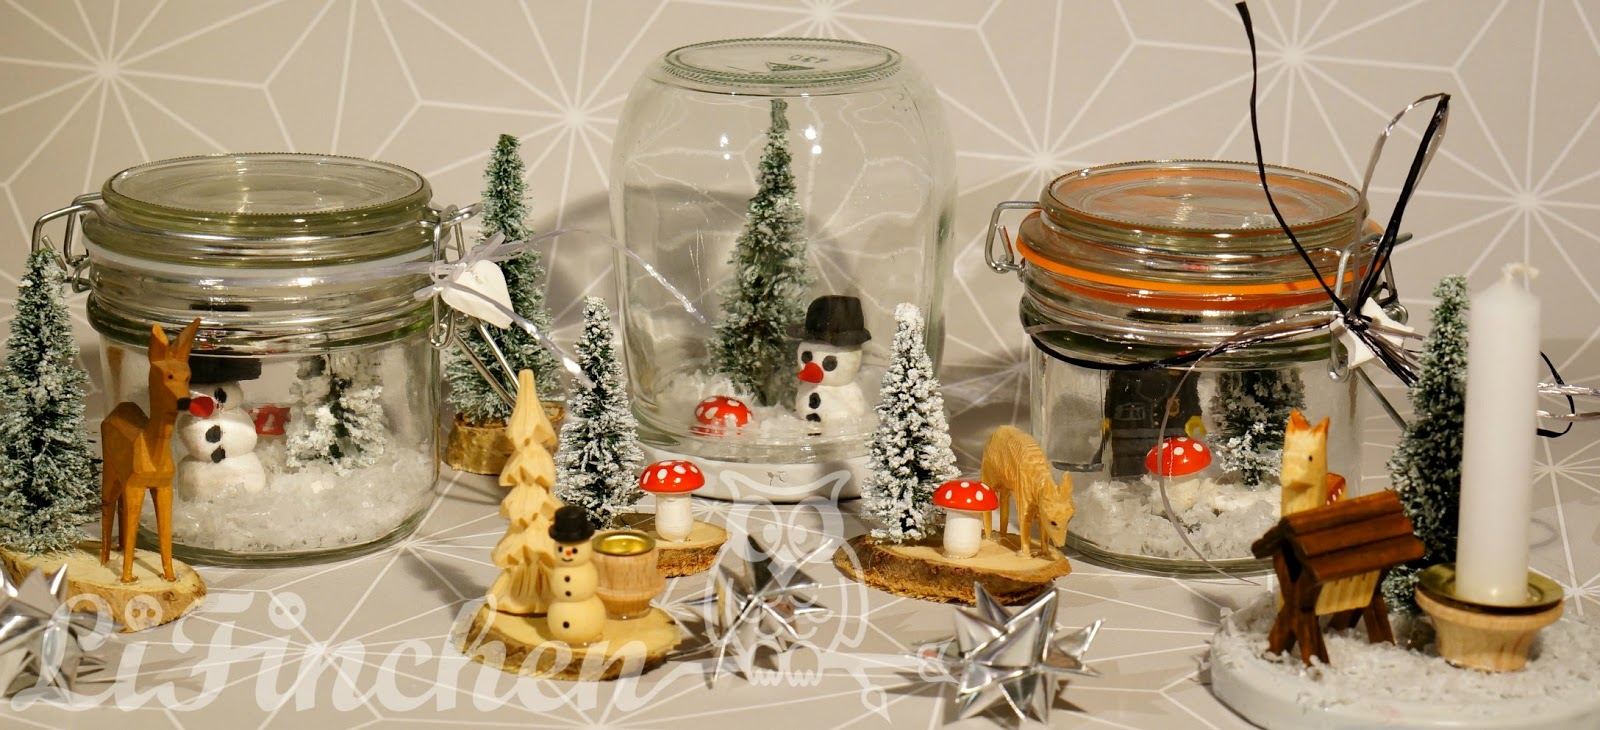 lifinchen winterlandschaft im glas. Black Bedroom Furniture Sets. Home Design Ideas